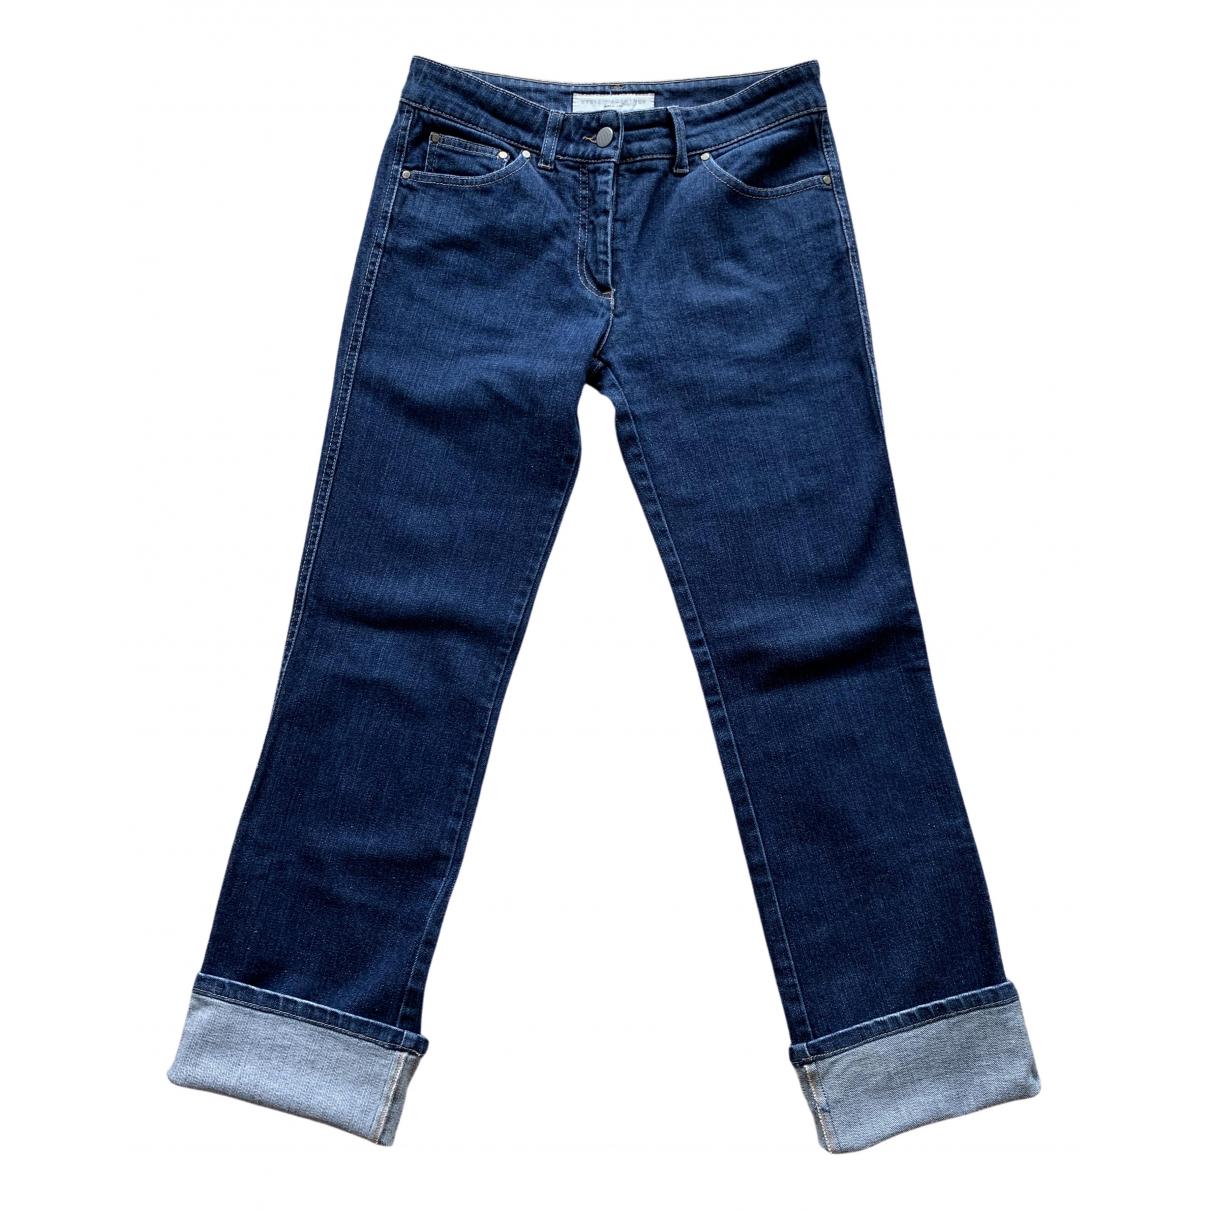 Stella Mccartney \N Blue Denim - Jeans Jeans for Women 40 FR